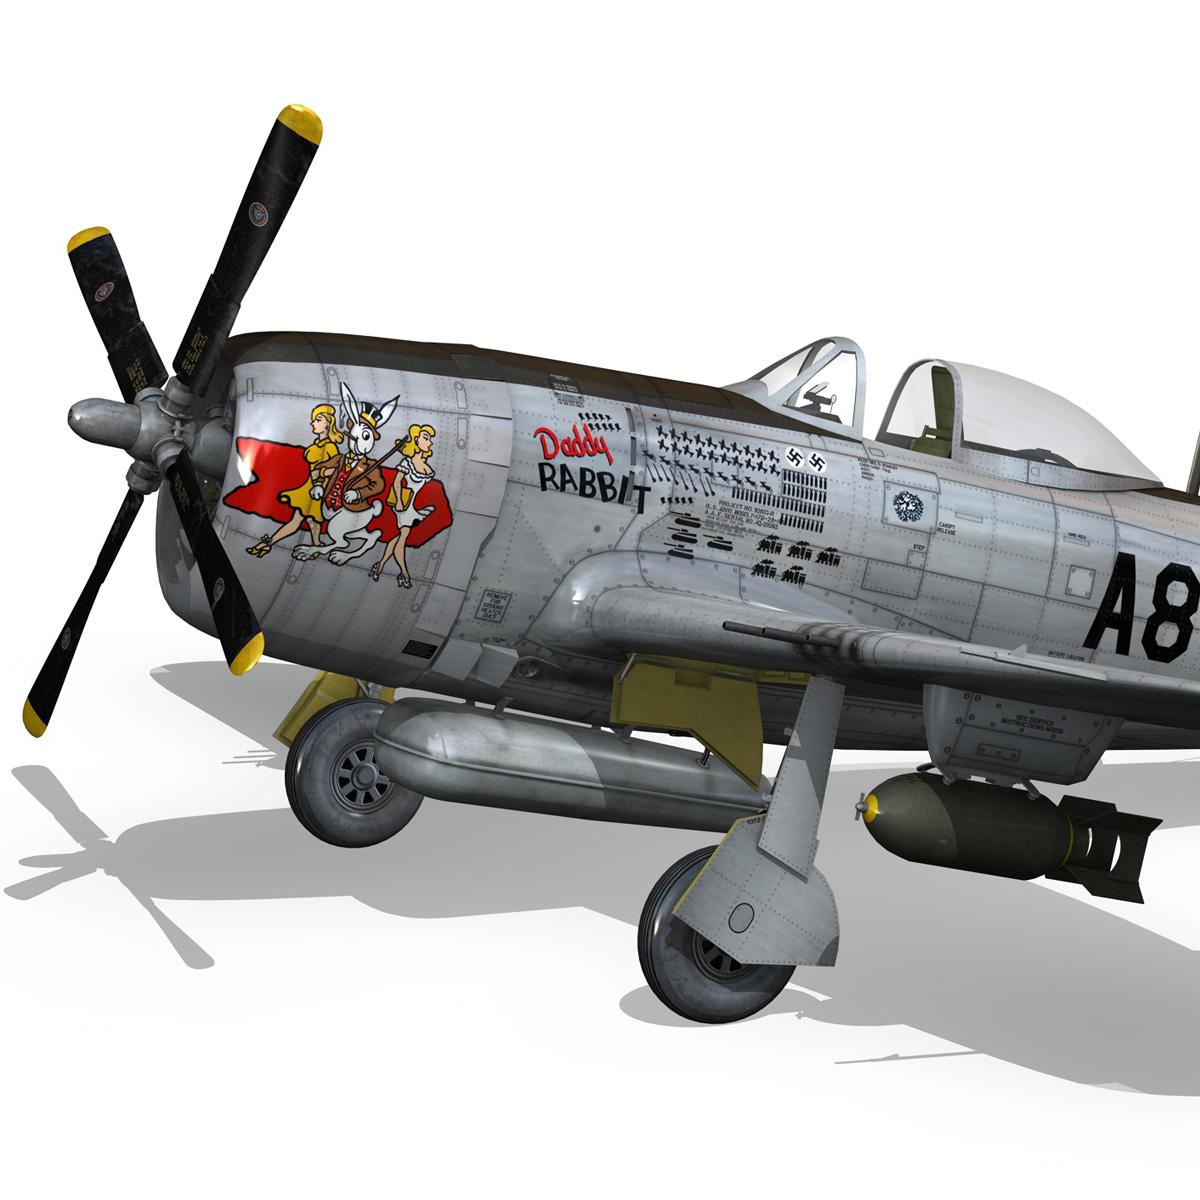 republic p-47 thunderbolt – daddy rabbit 3d model fbx c4d lwo obj 272696